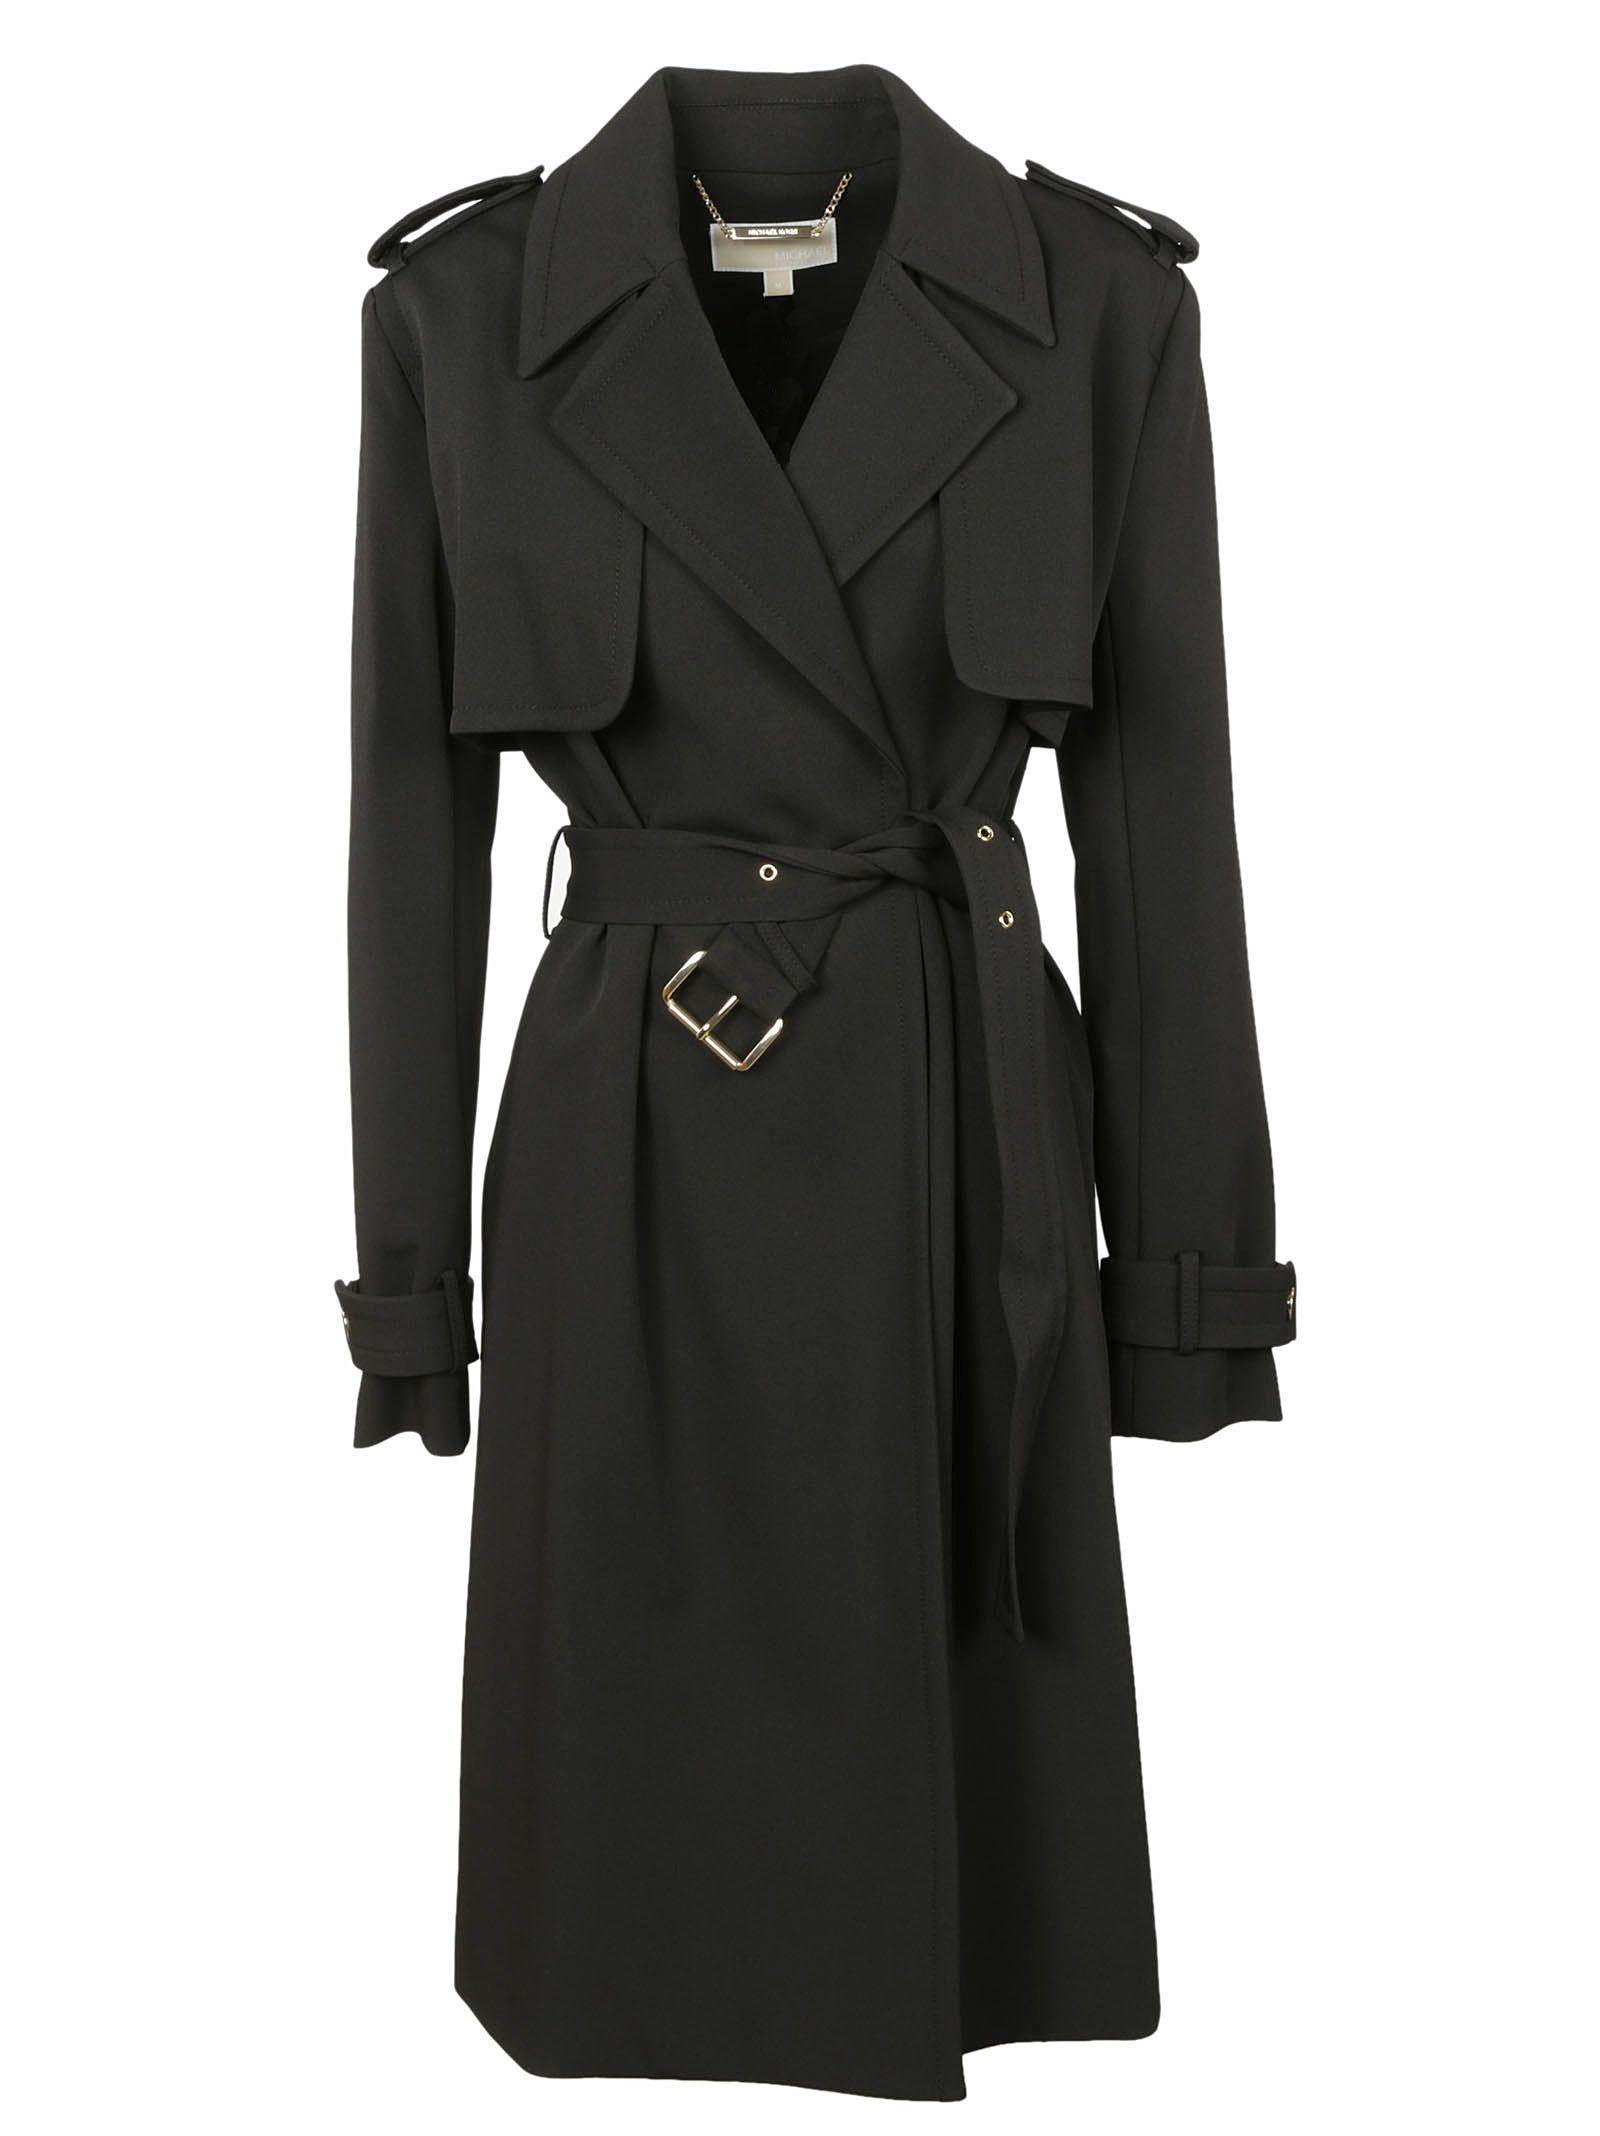 Michael kors women coats